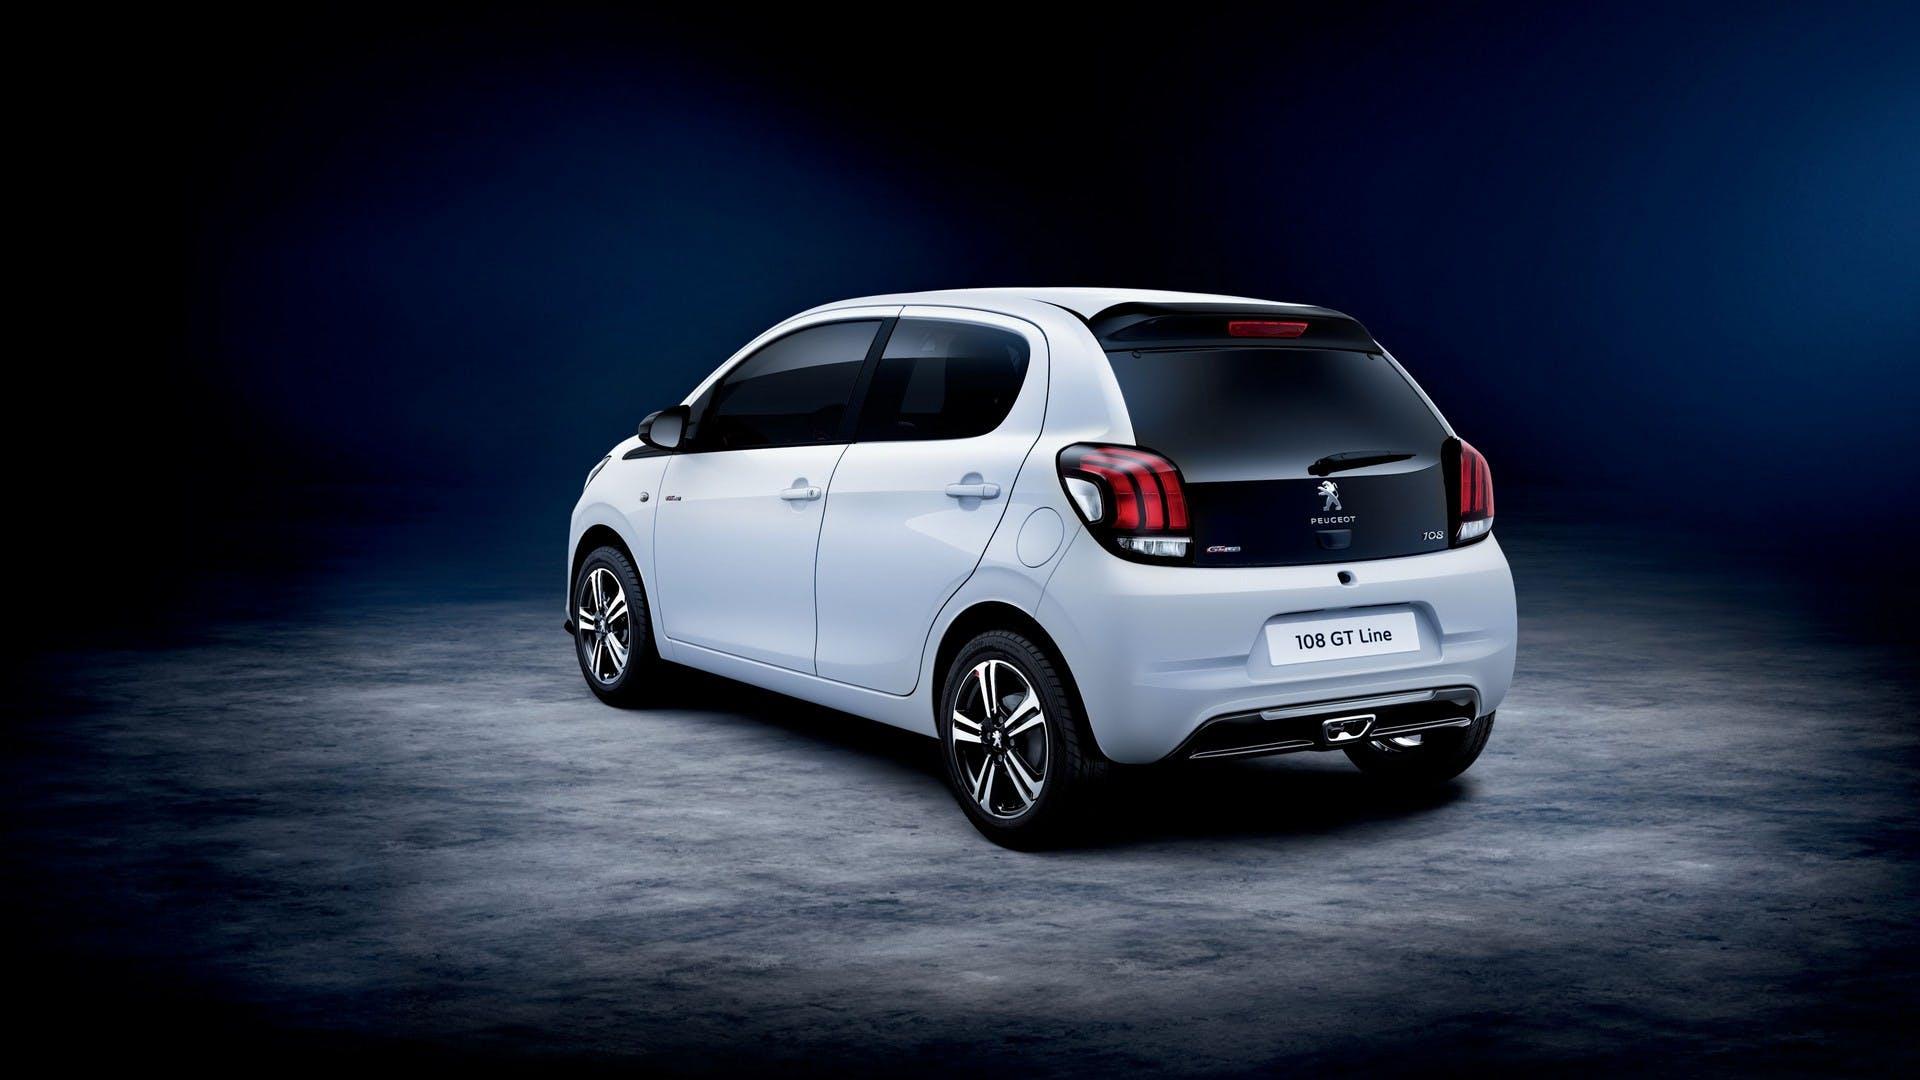 Peugeot-108-GT-Line bianca